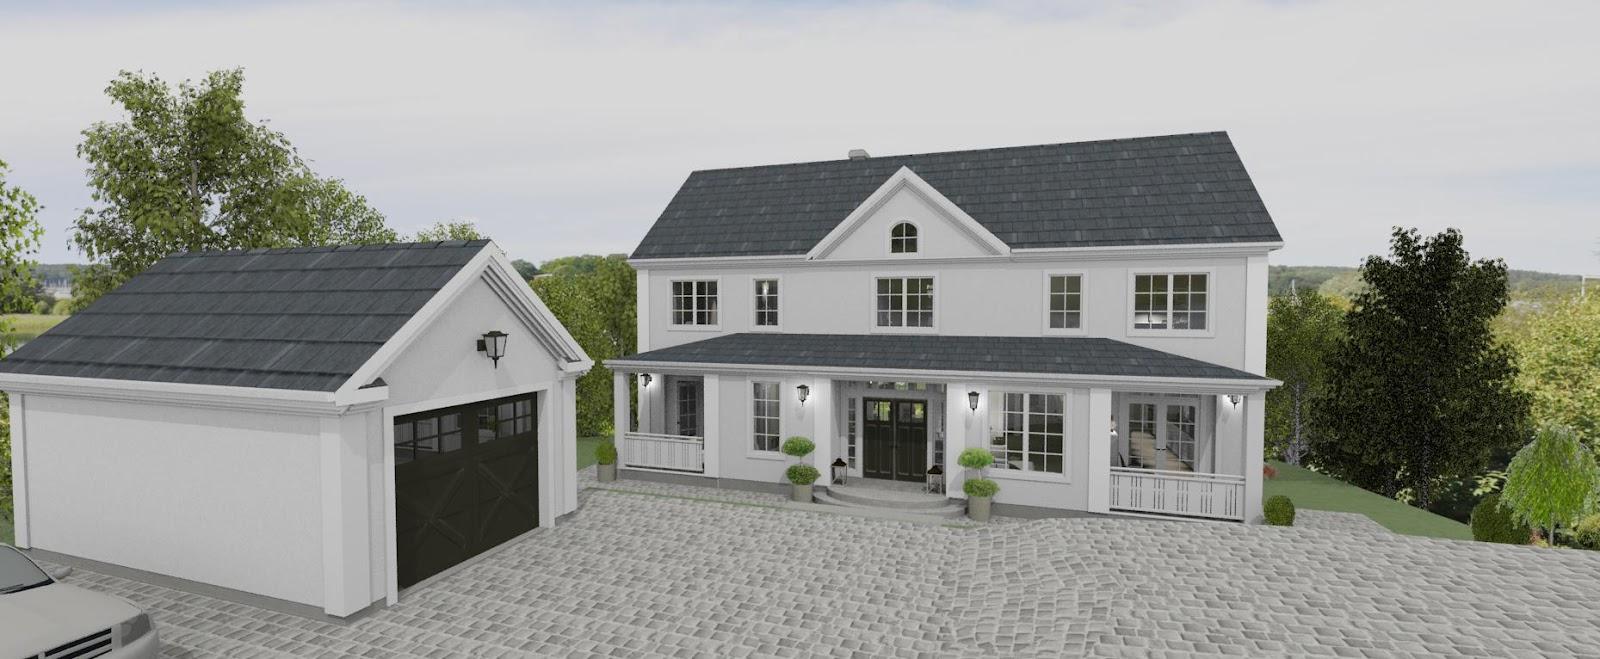 hus med garage i botten